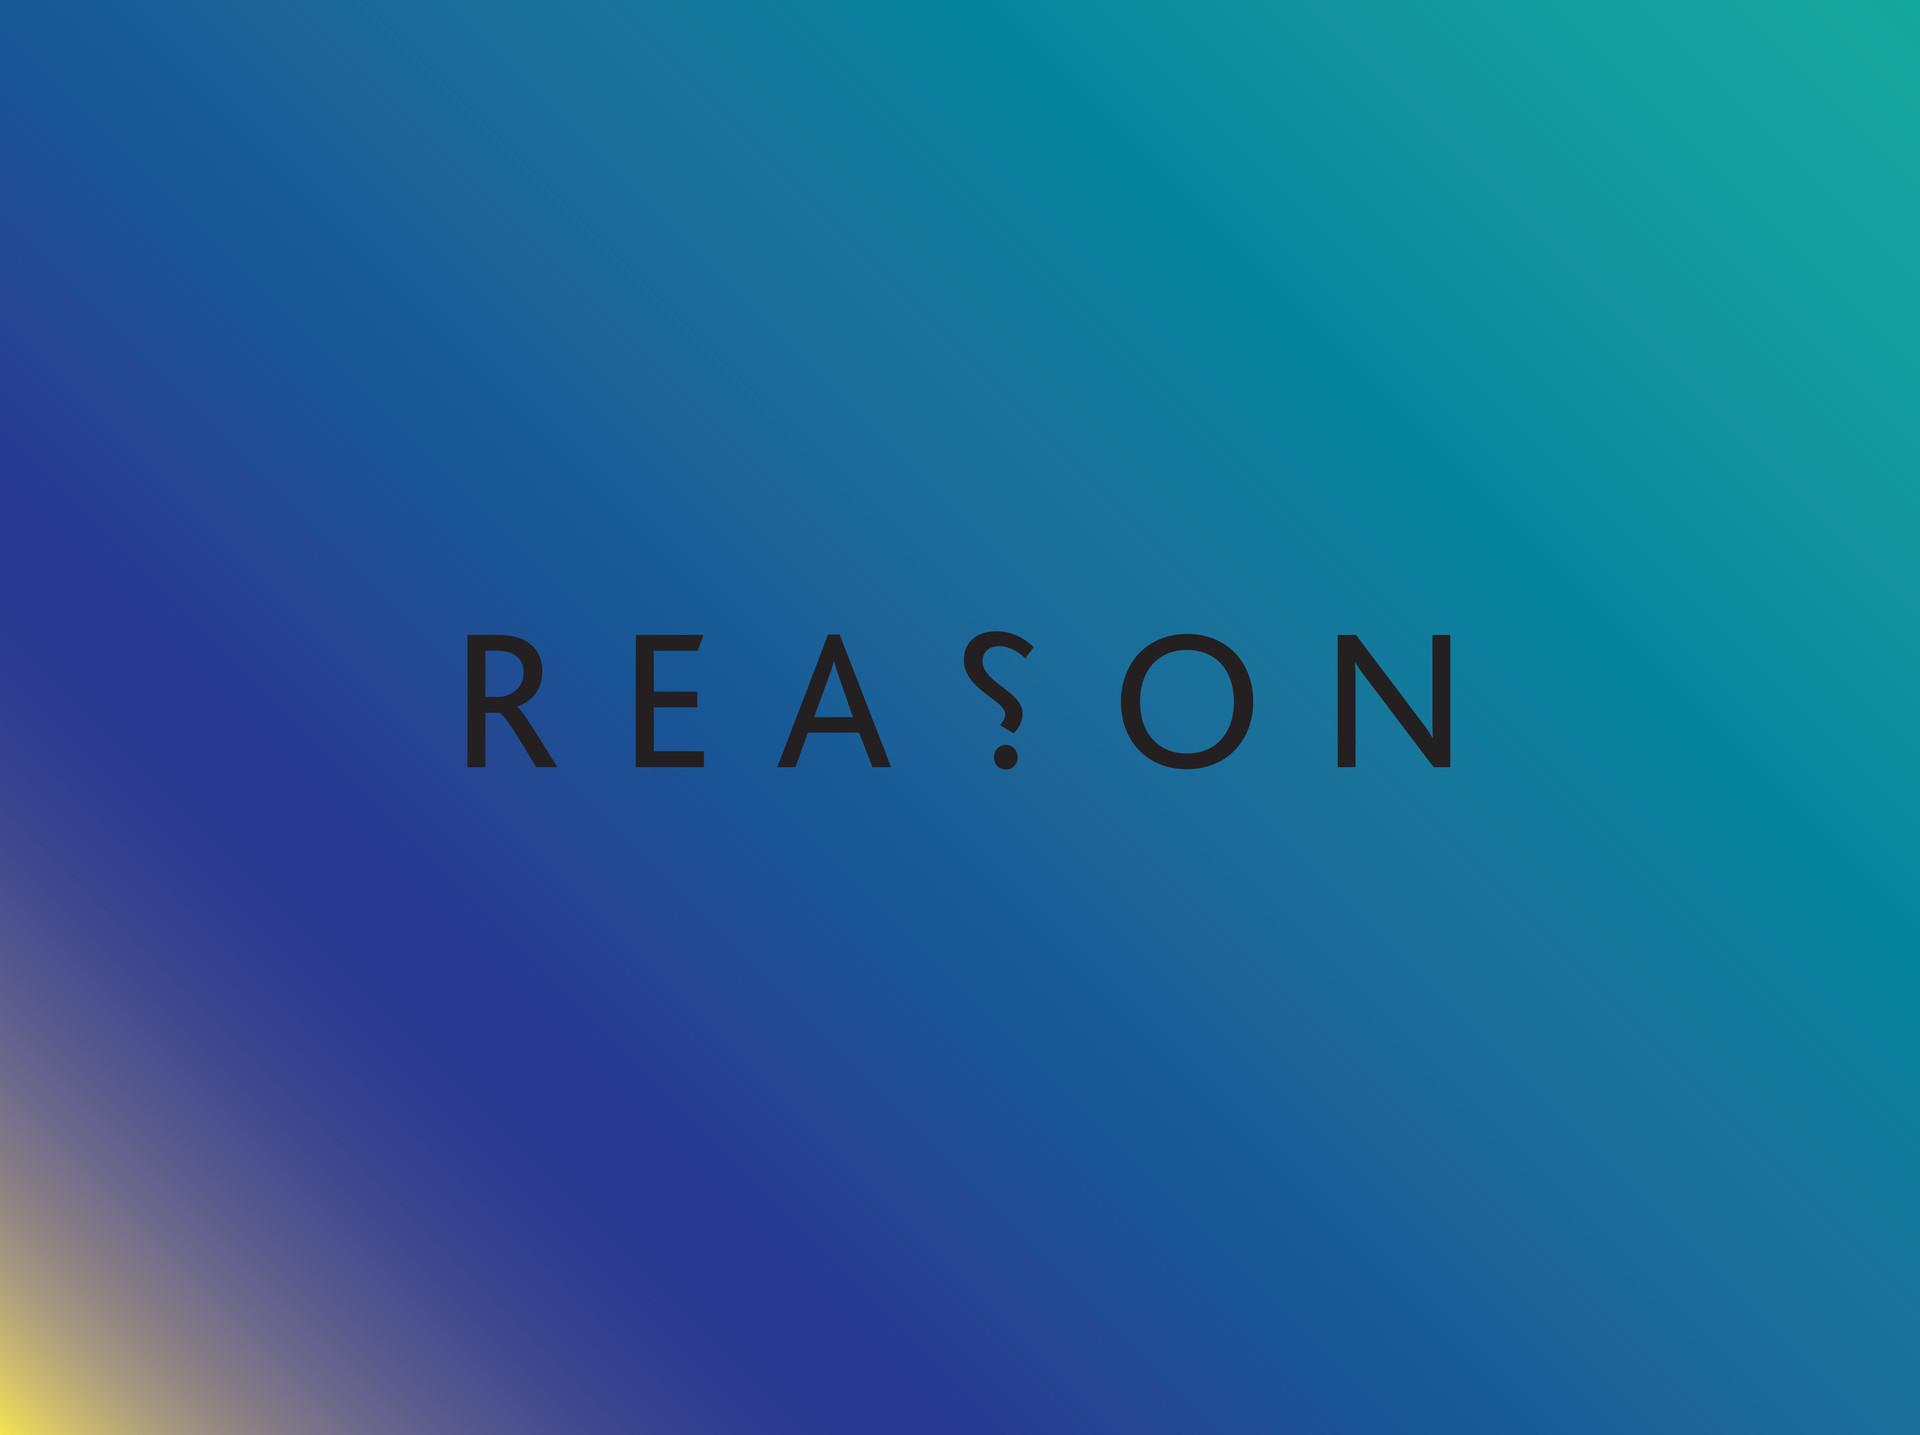 reasonlogoweb.jpg